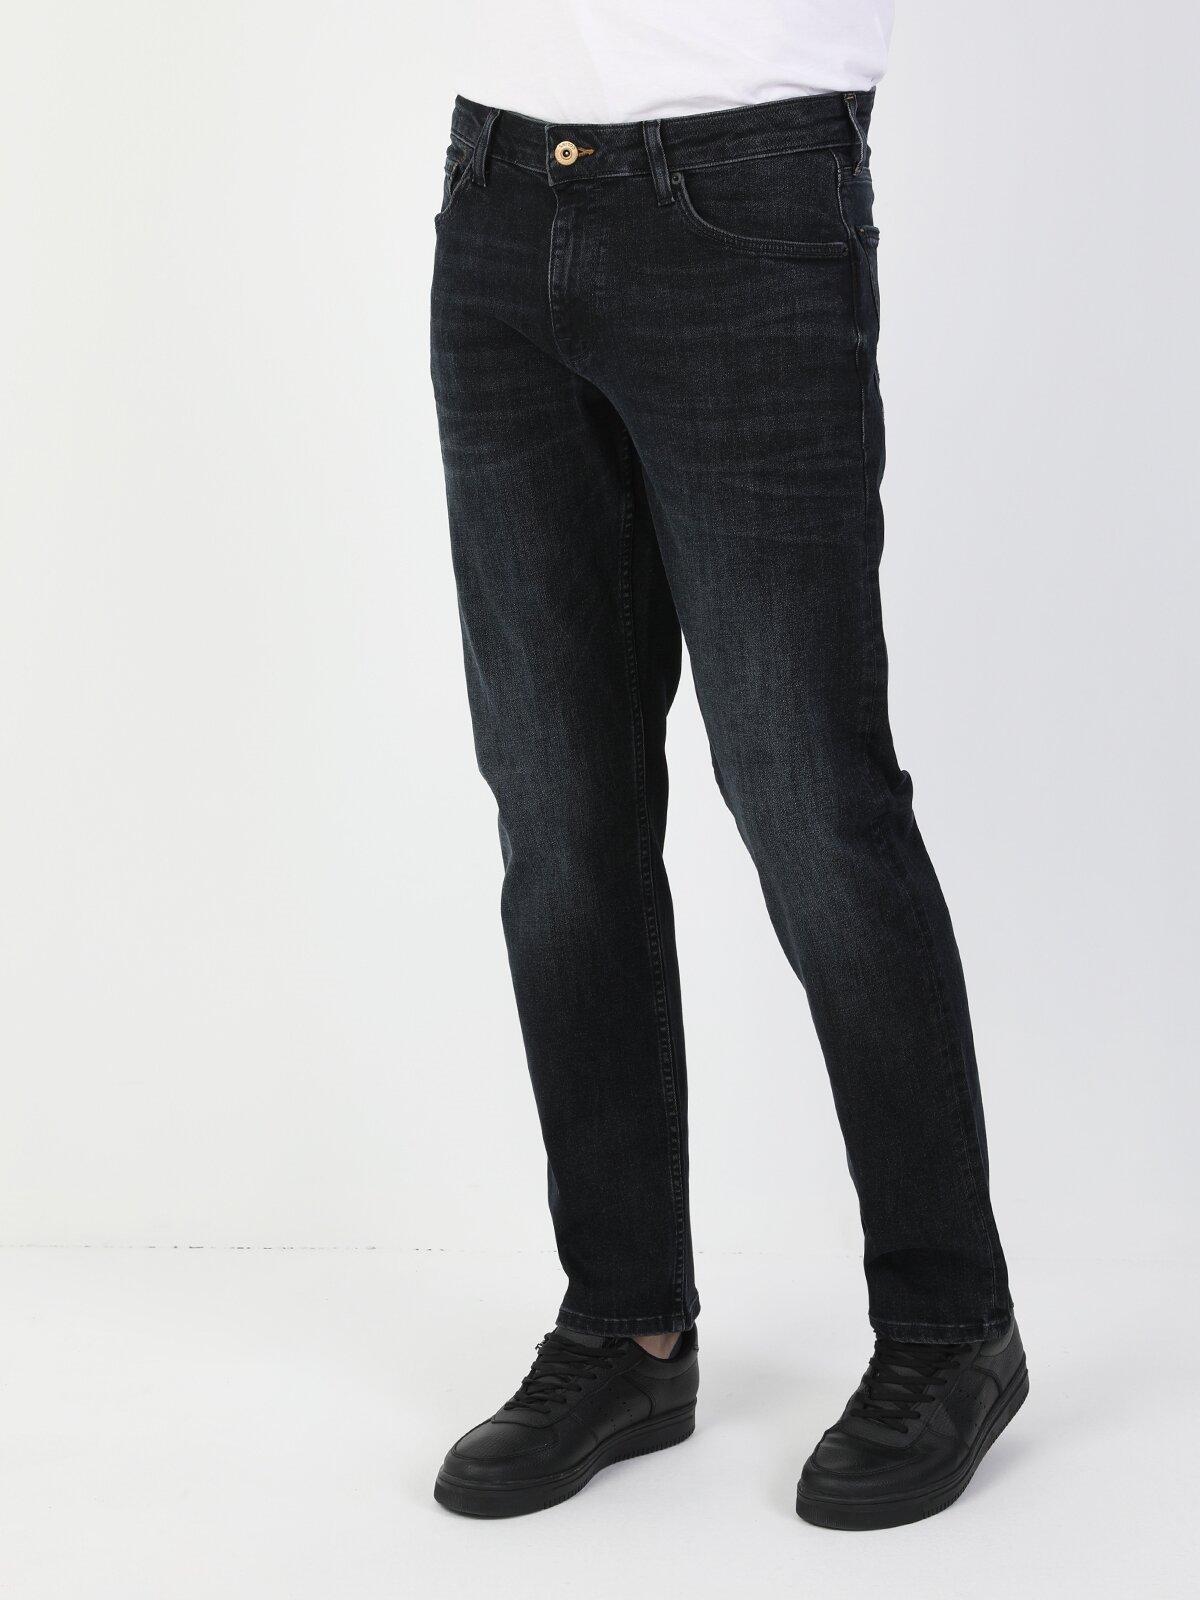 45 David Normal Kesim Normal Bel Düz Paça Erkek Siyah Jean Pantolon